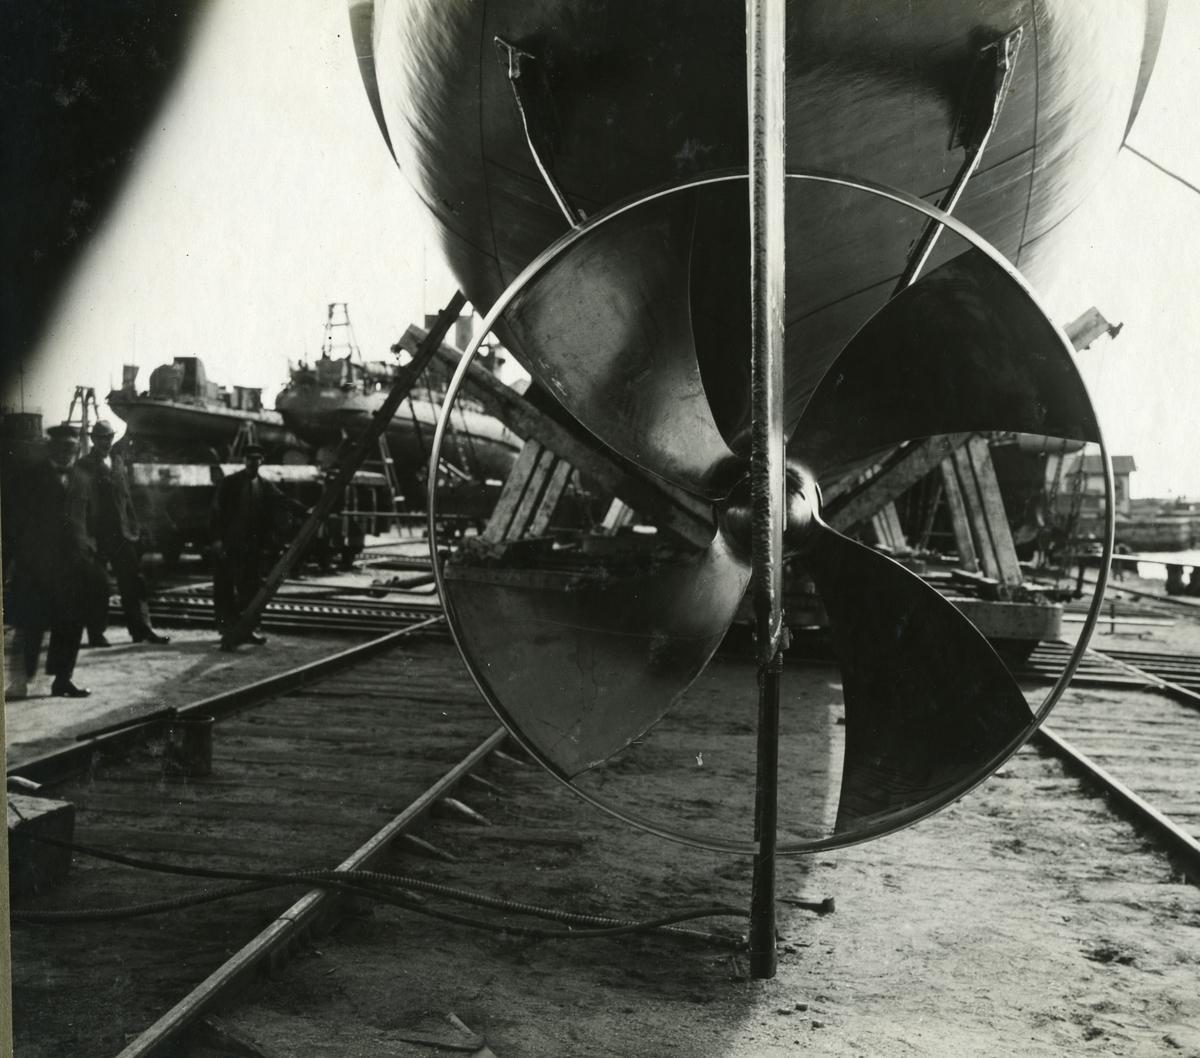 Fartyg: ALTAIR                          Byggår: 1909 Varv: Bergsunds MV Övrigt: Torpedbåten Altair grillpropeller.